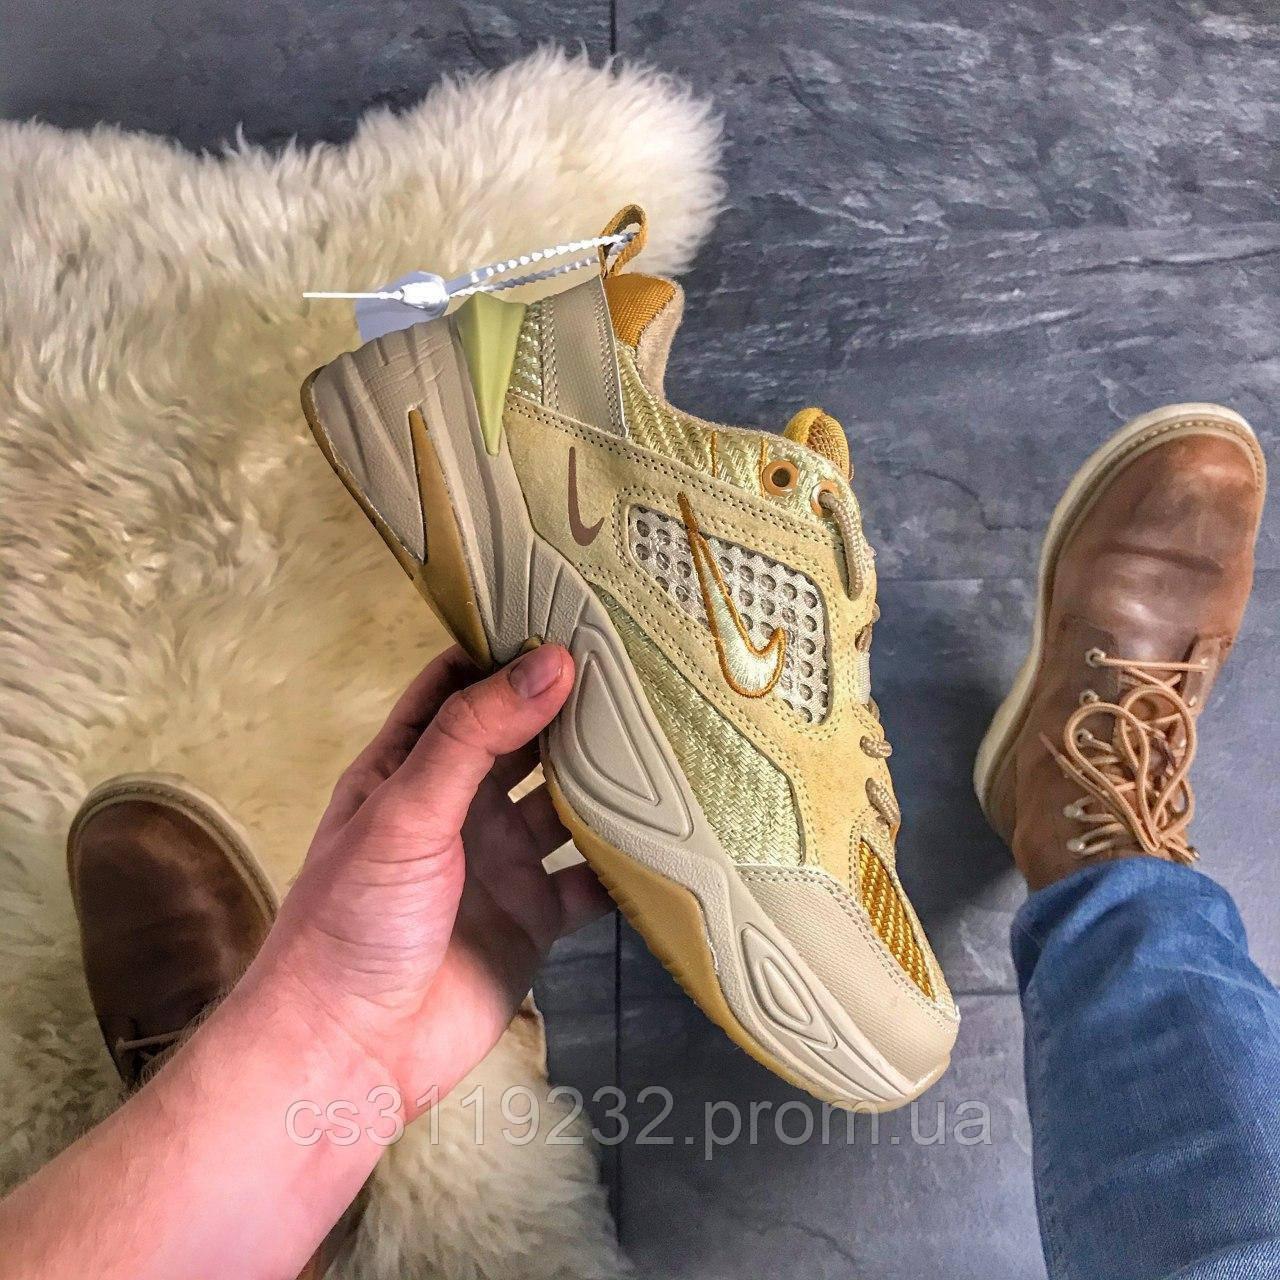 Женские кроссовки  Nike M2K Tekno Linen & Wheat & Ale Brown (бежевые)